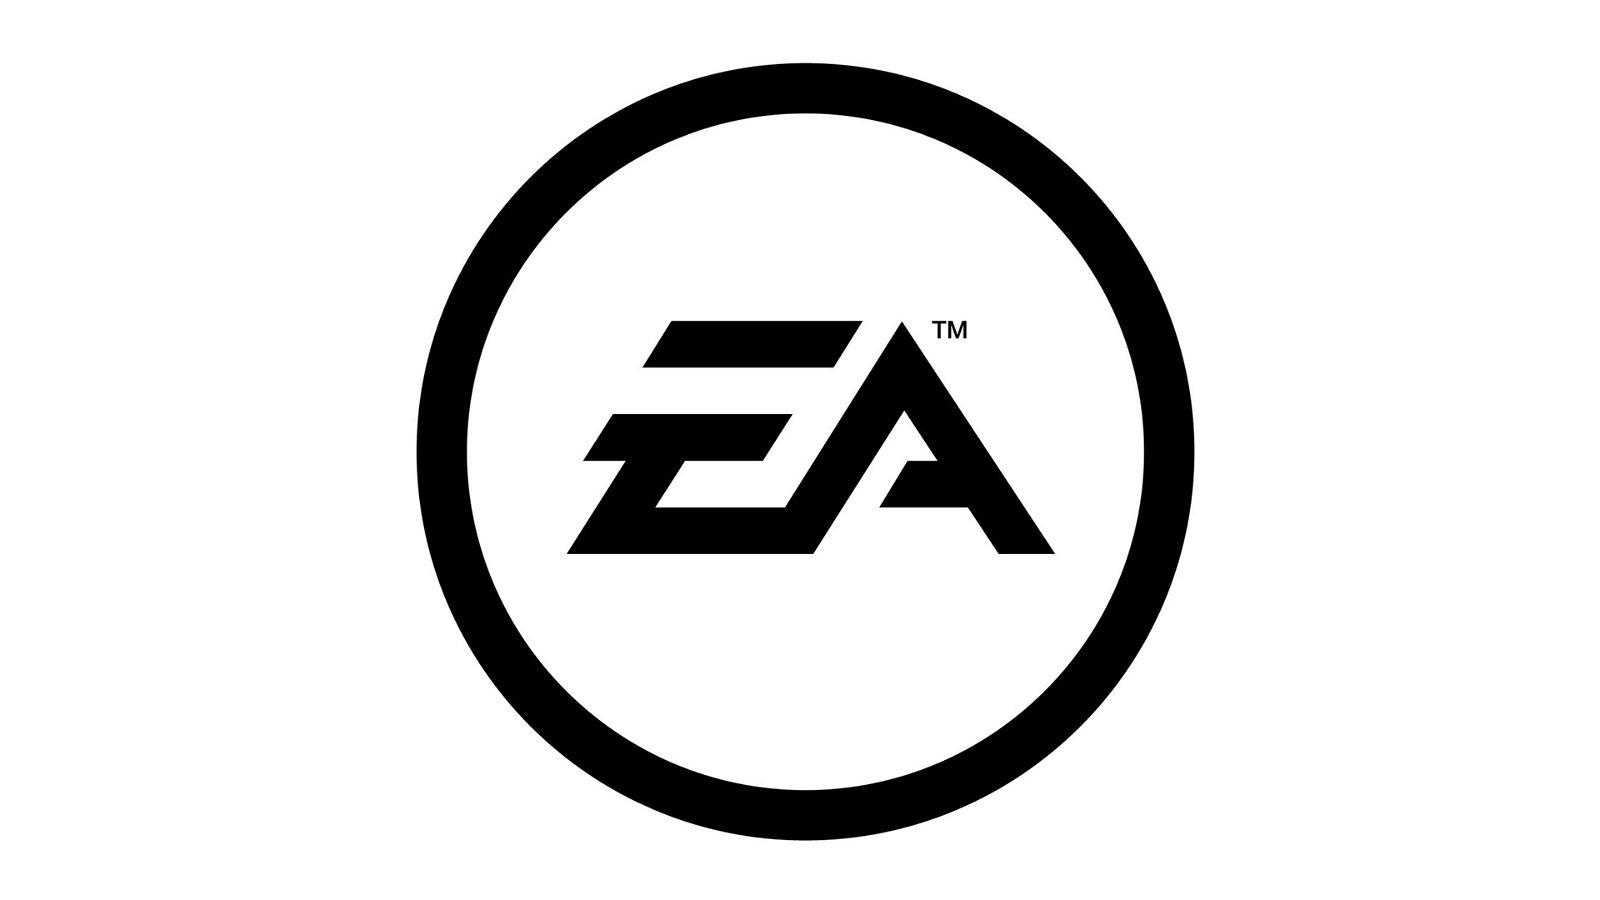 EA announces new member of executive leadership team 2